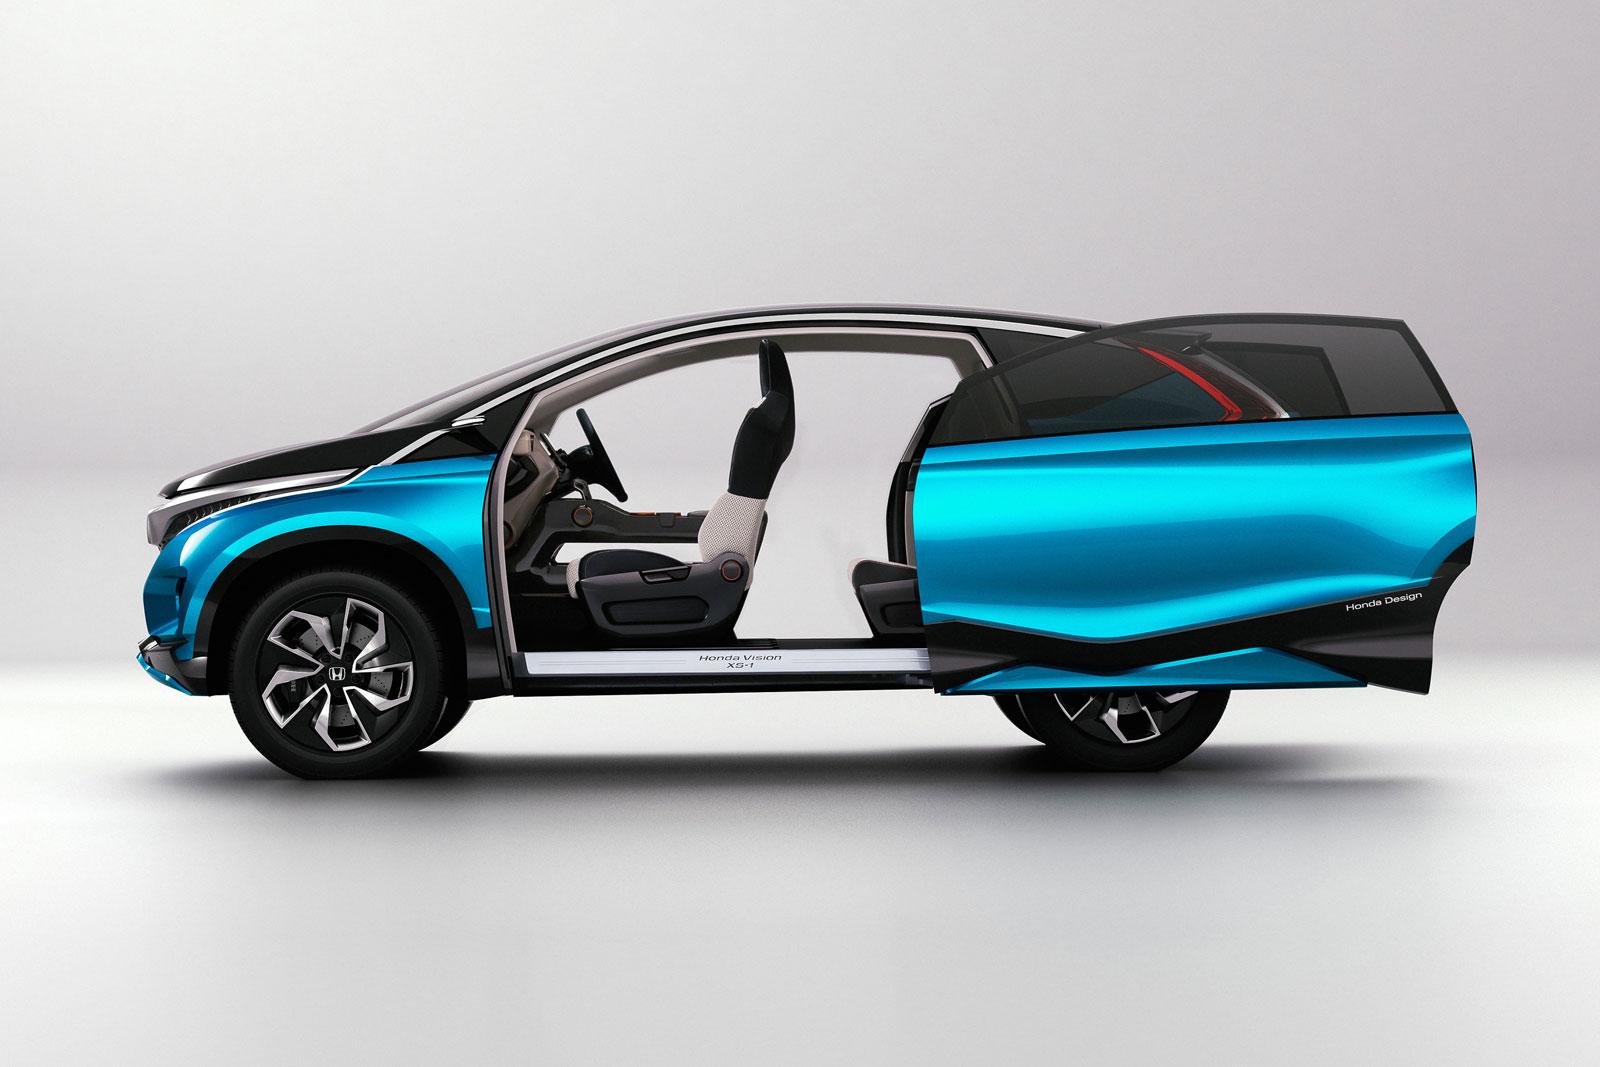 Honda Vision Xs 1 Concept Sliding Door Car Body Design